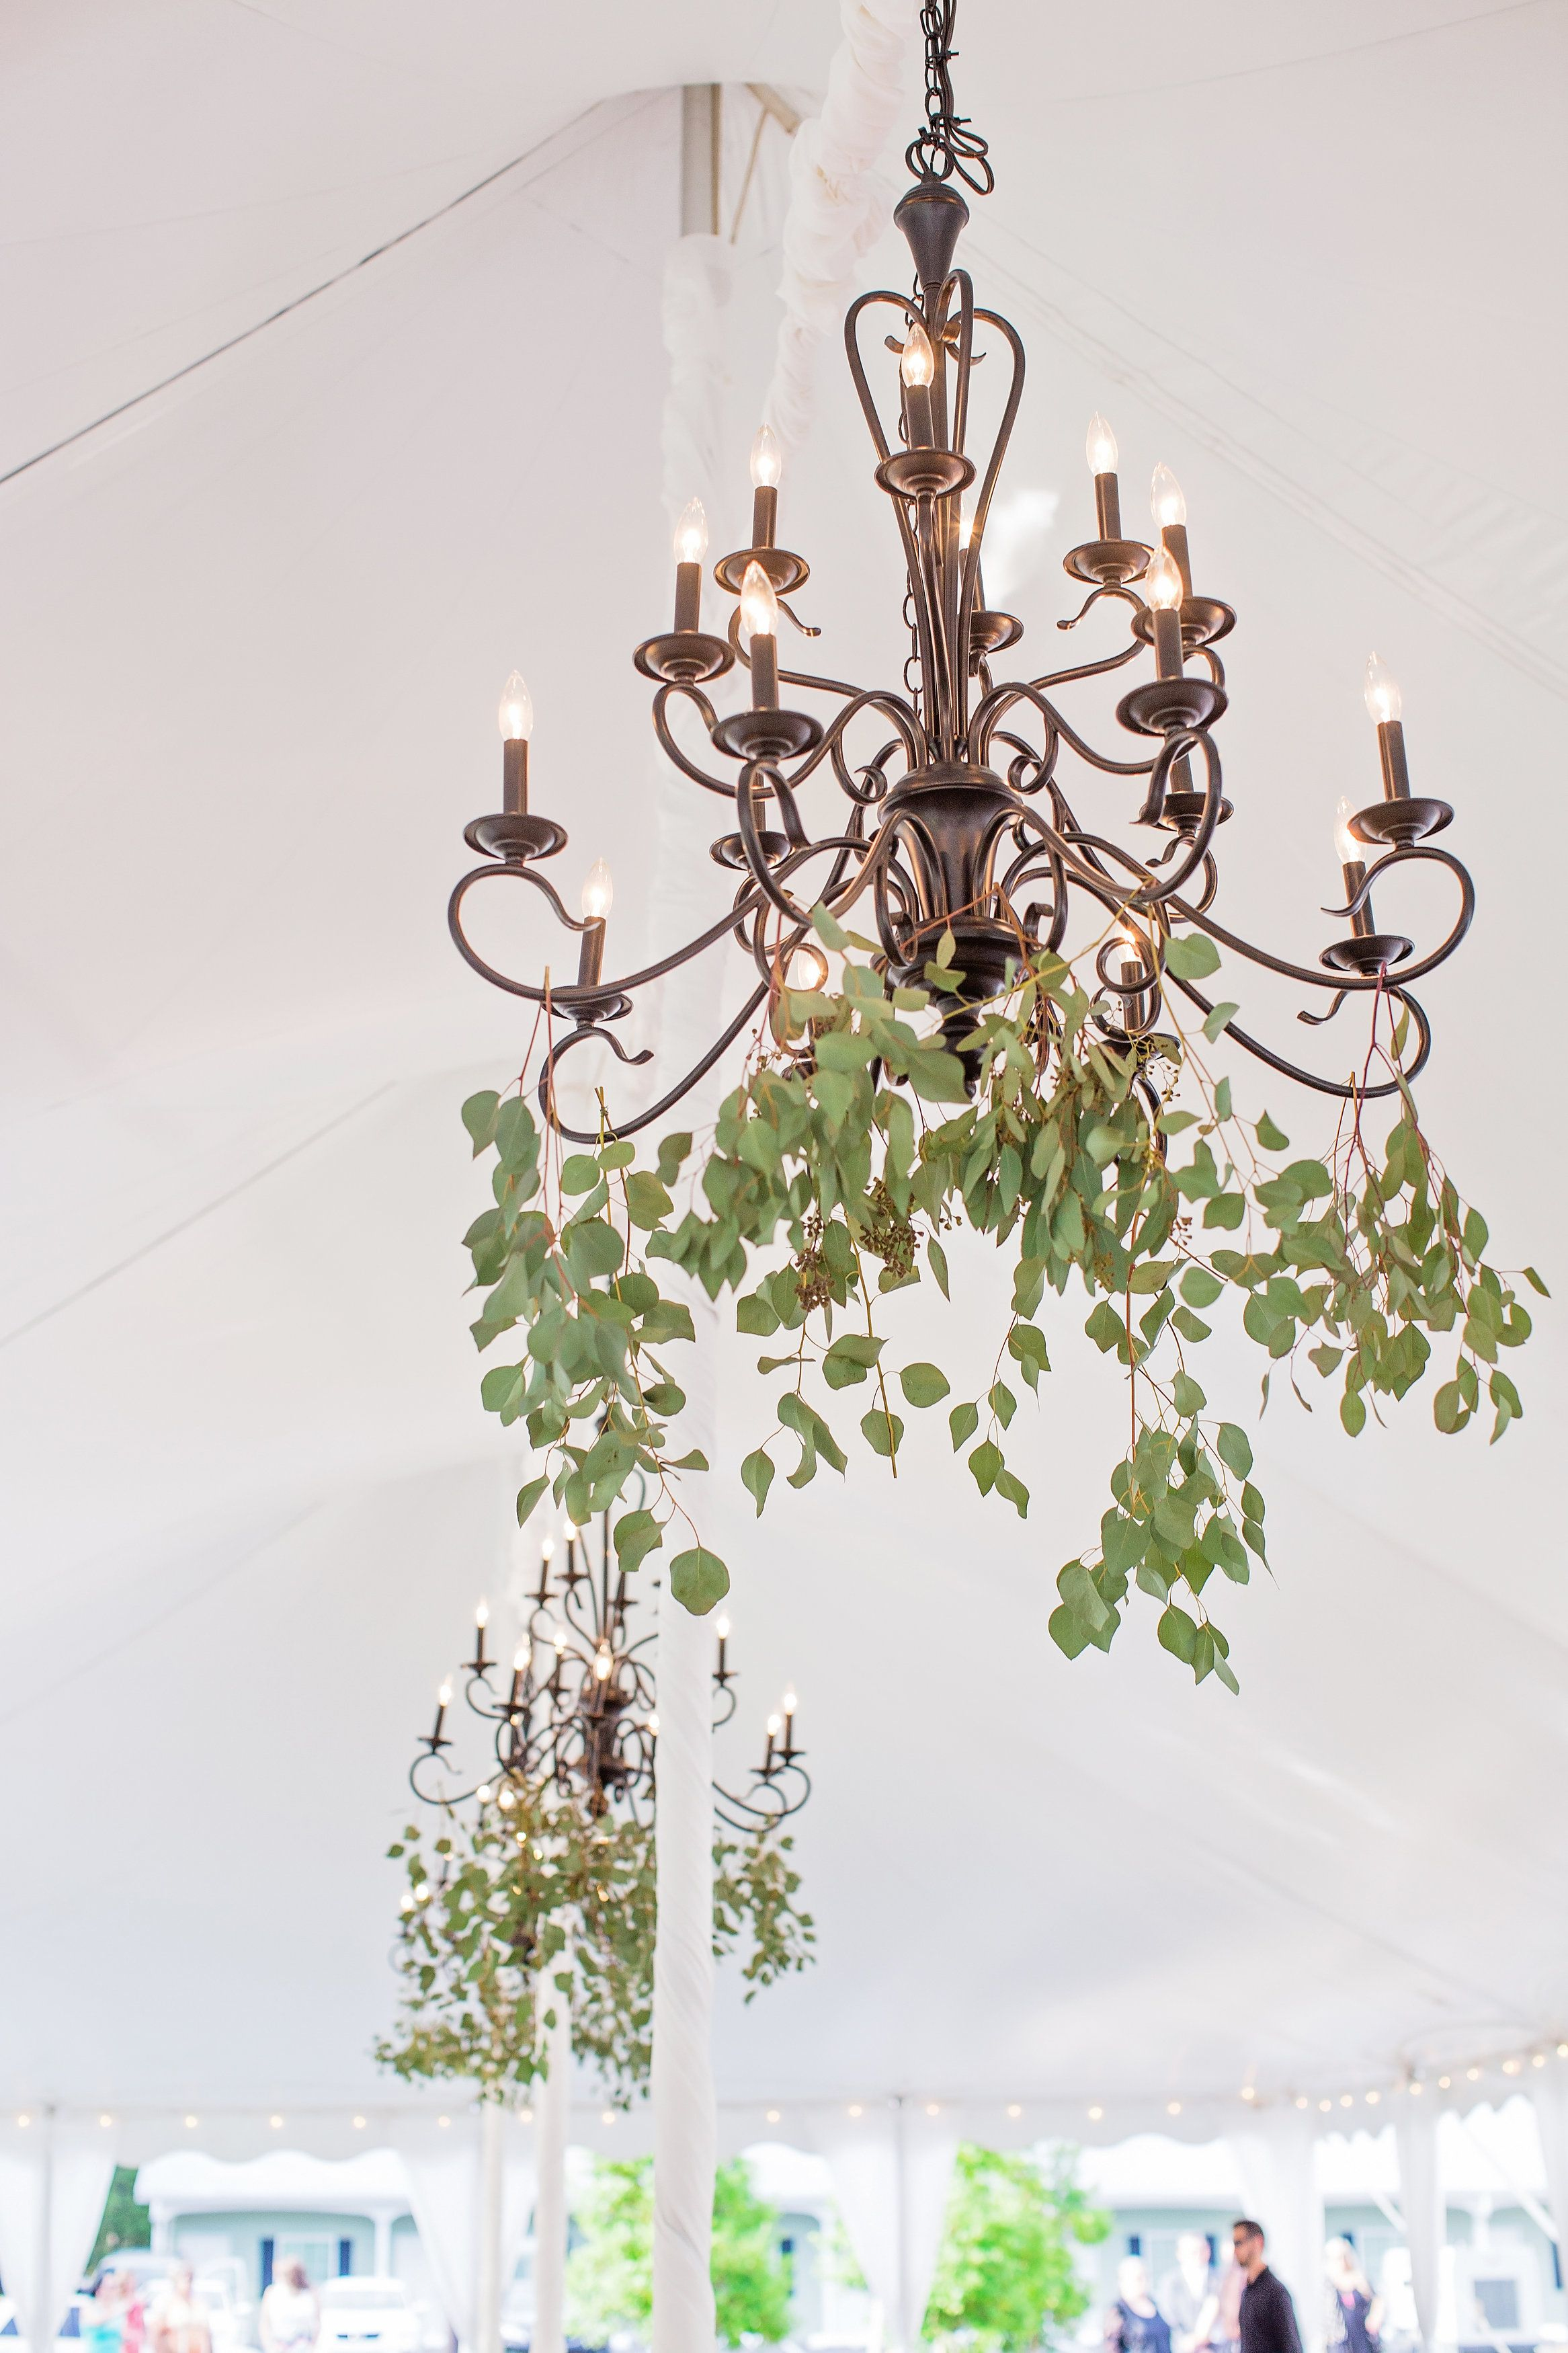 Greenery hanging in chandeliers wedding tent decoration ideas foral greenery hanging in chandeliers wedding tent decoration ideas foral chandeliers chandeliers with greenery designed by arubaitofo Gallery